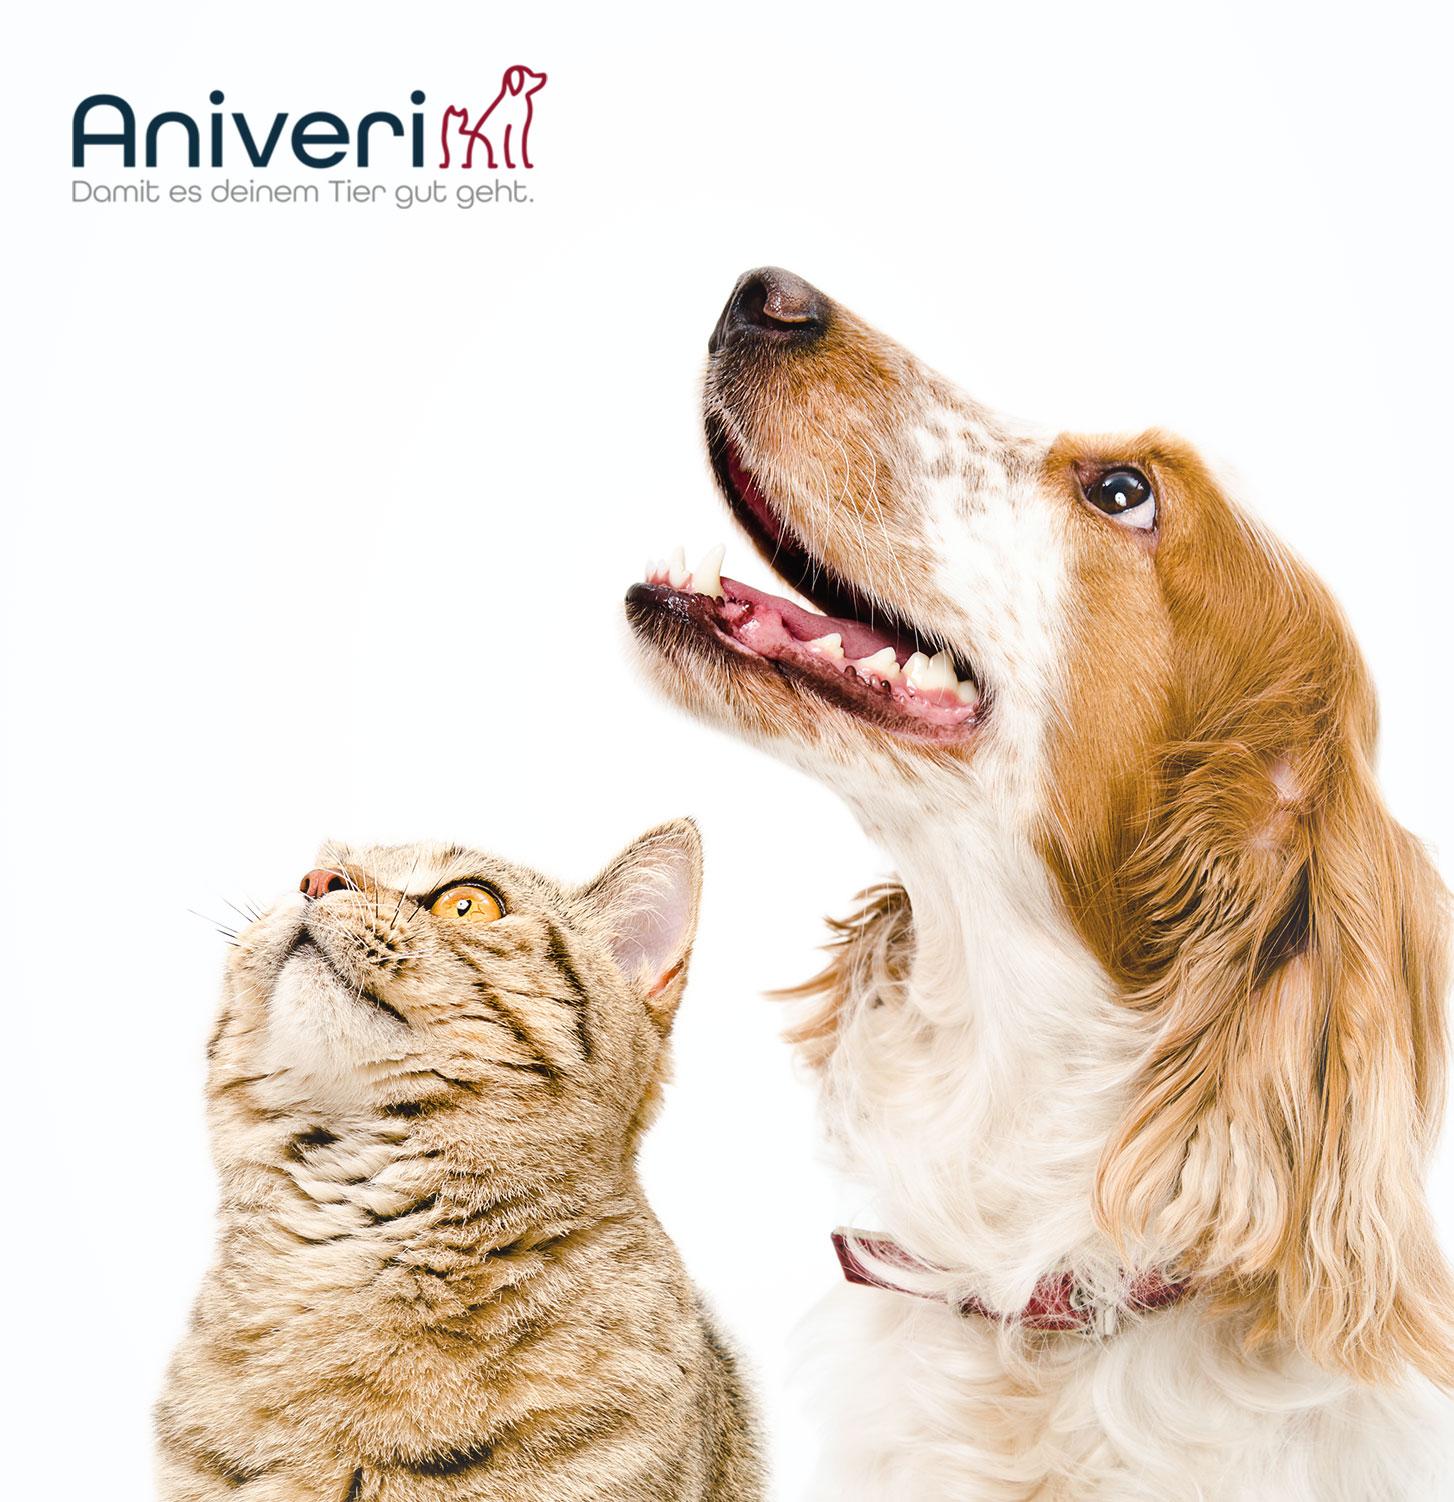 Neue Marke: Aniveri